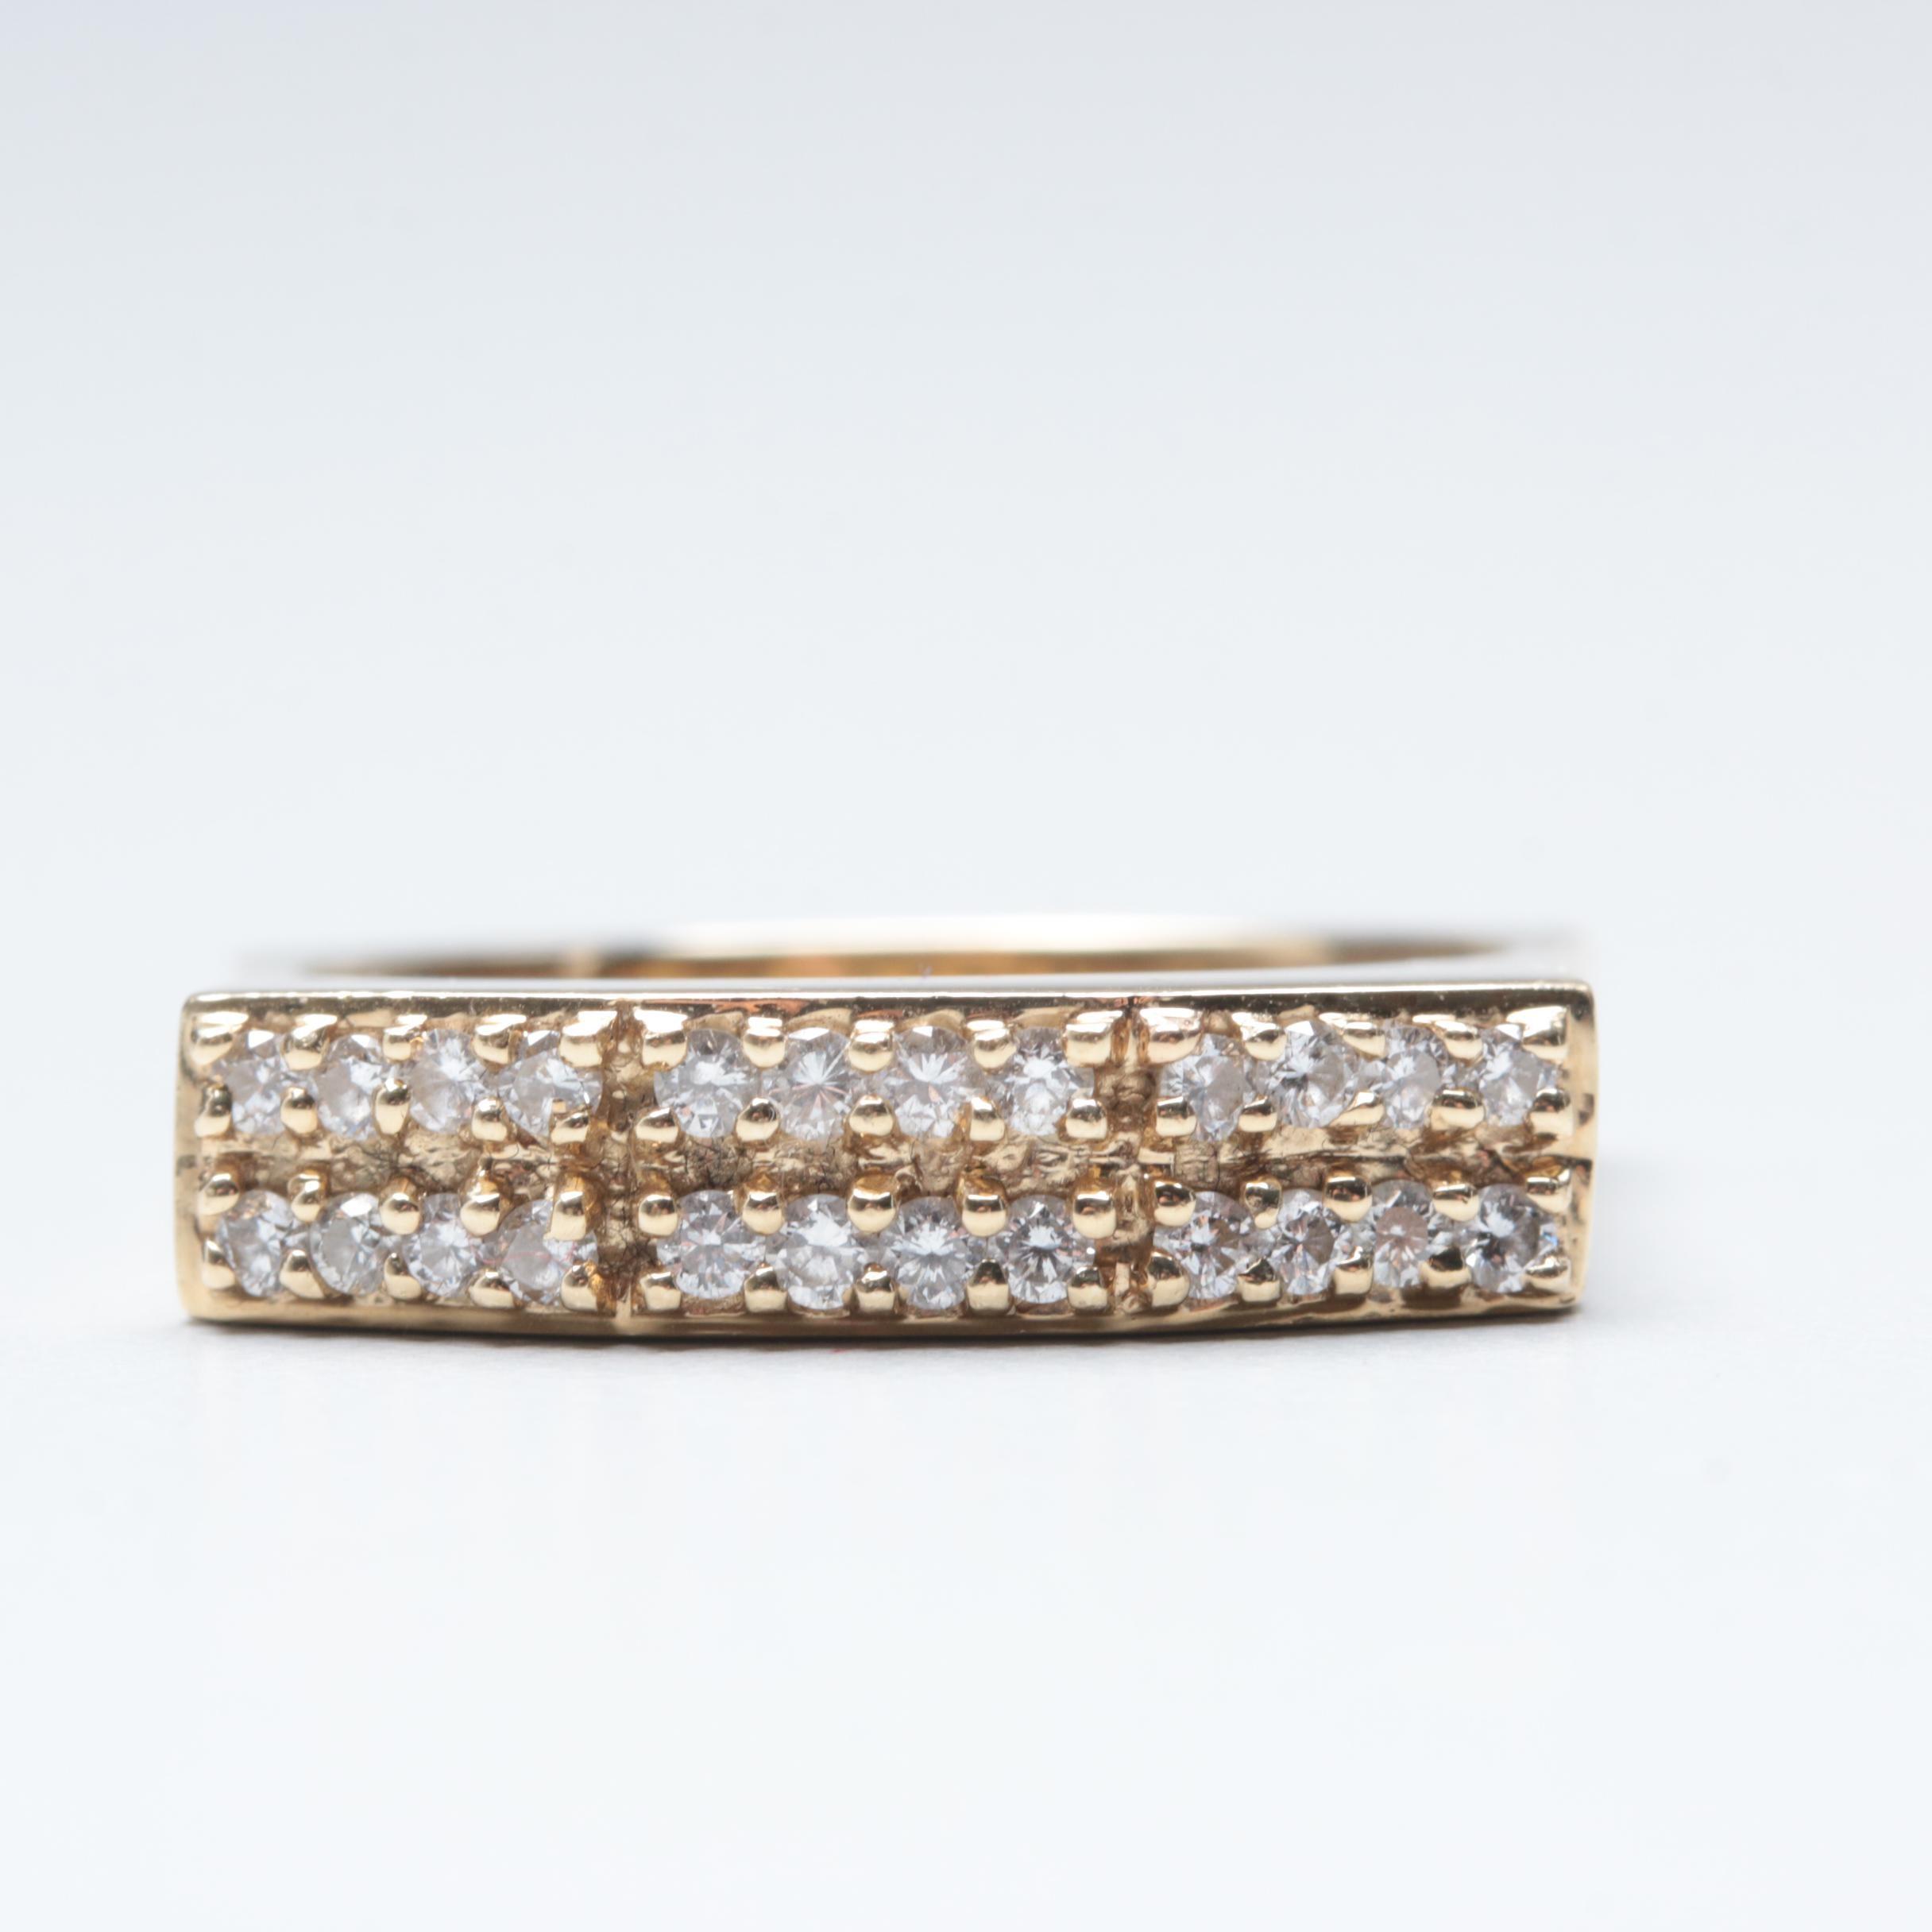 Contemporary Sonia Bitton 14K Yellow Gold Diamond Ring